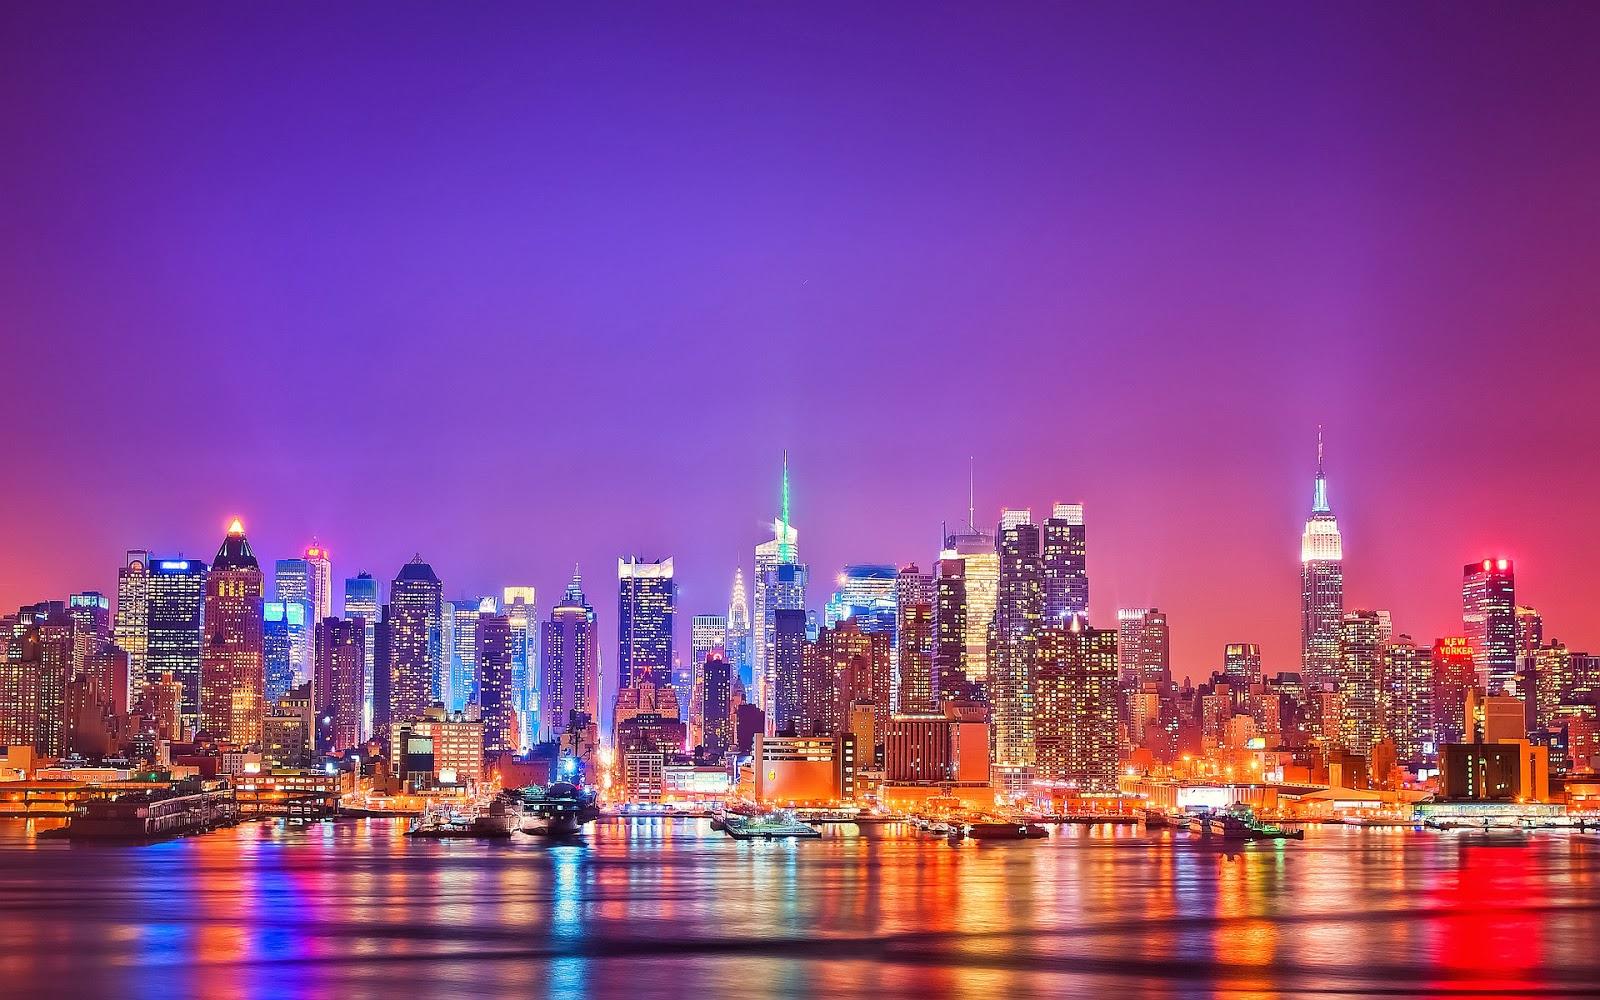 New York City HD WallpapersPics   HD Wallpapers Blog 1600x1000